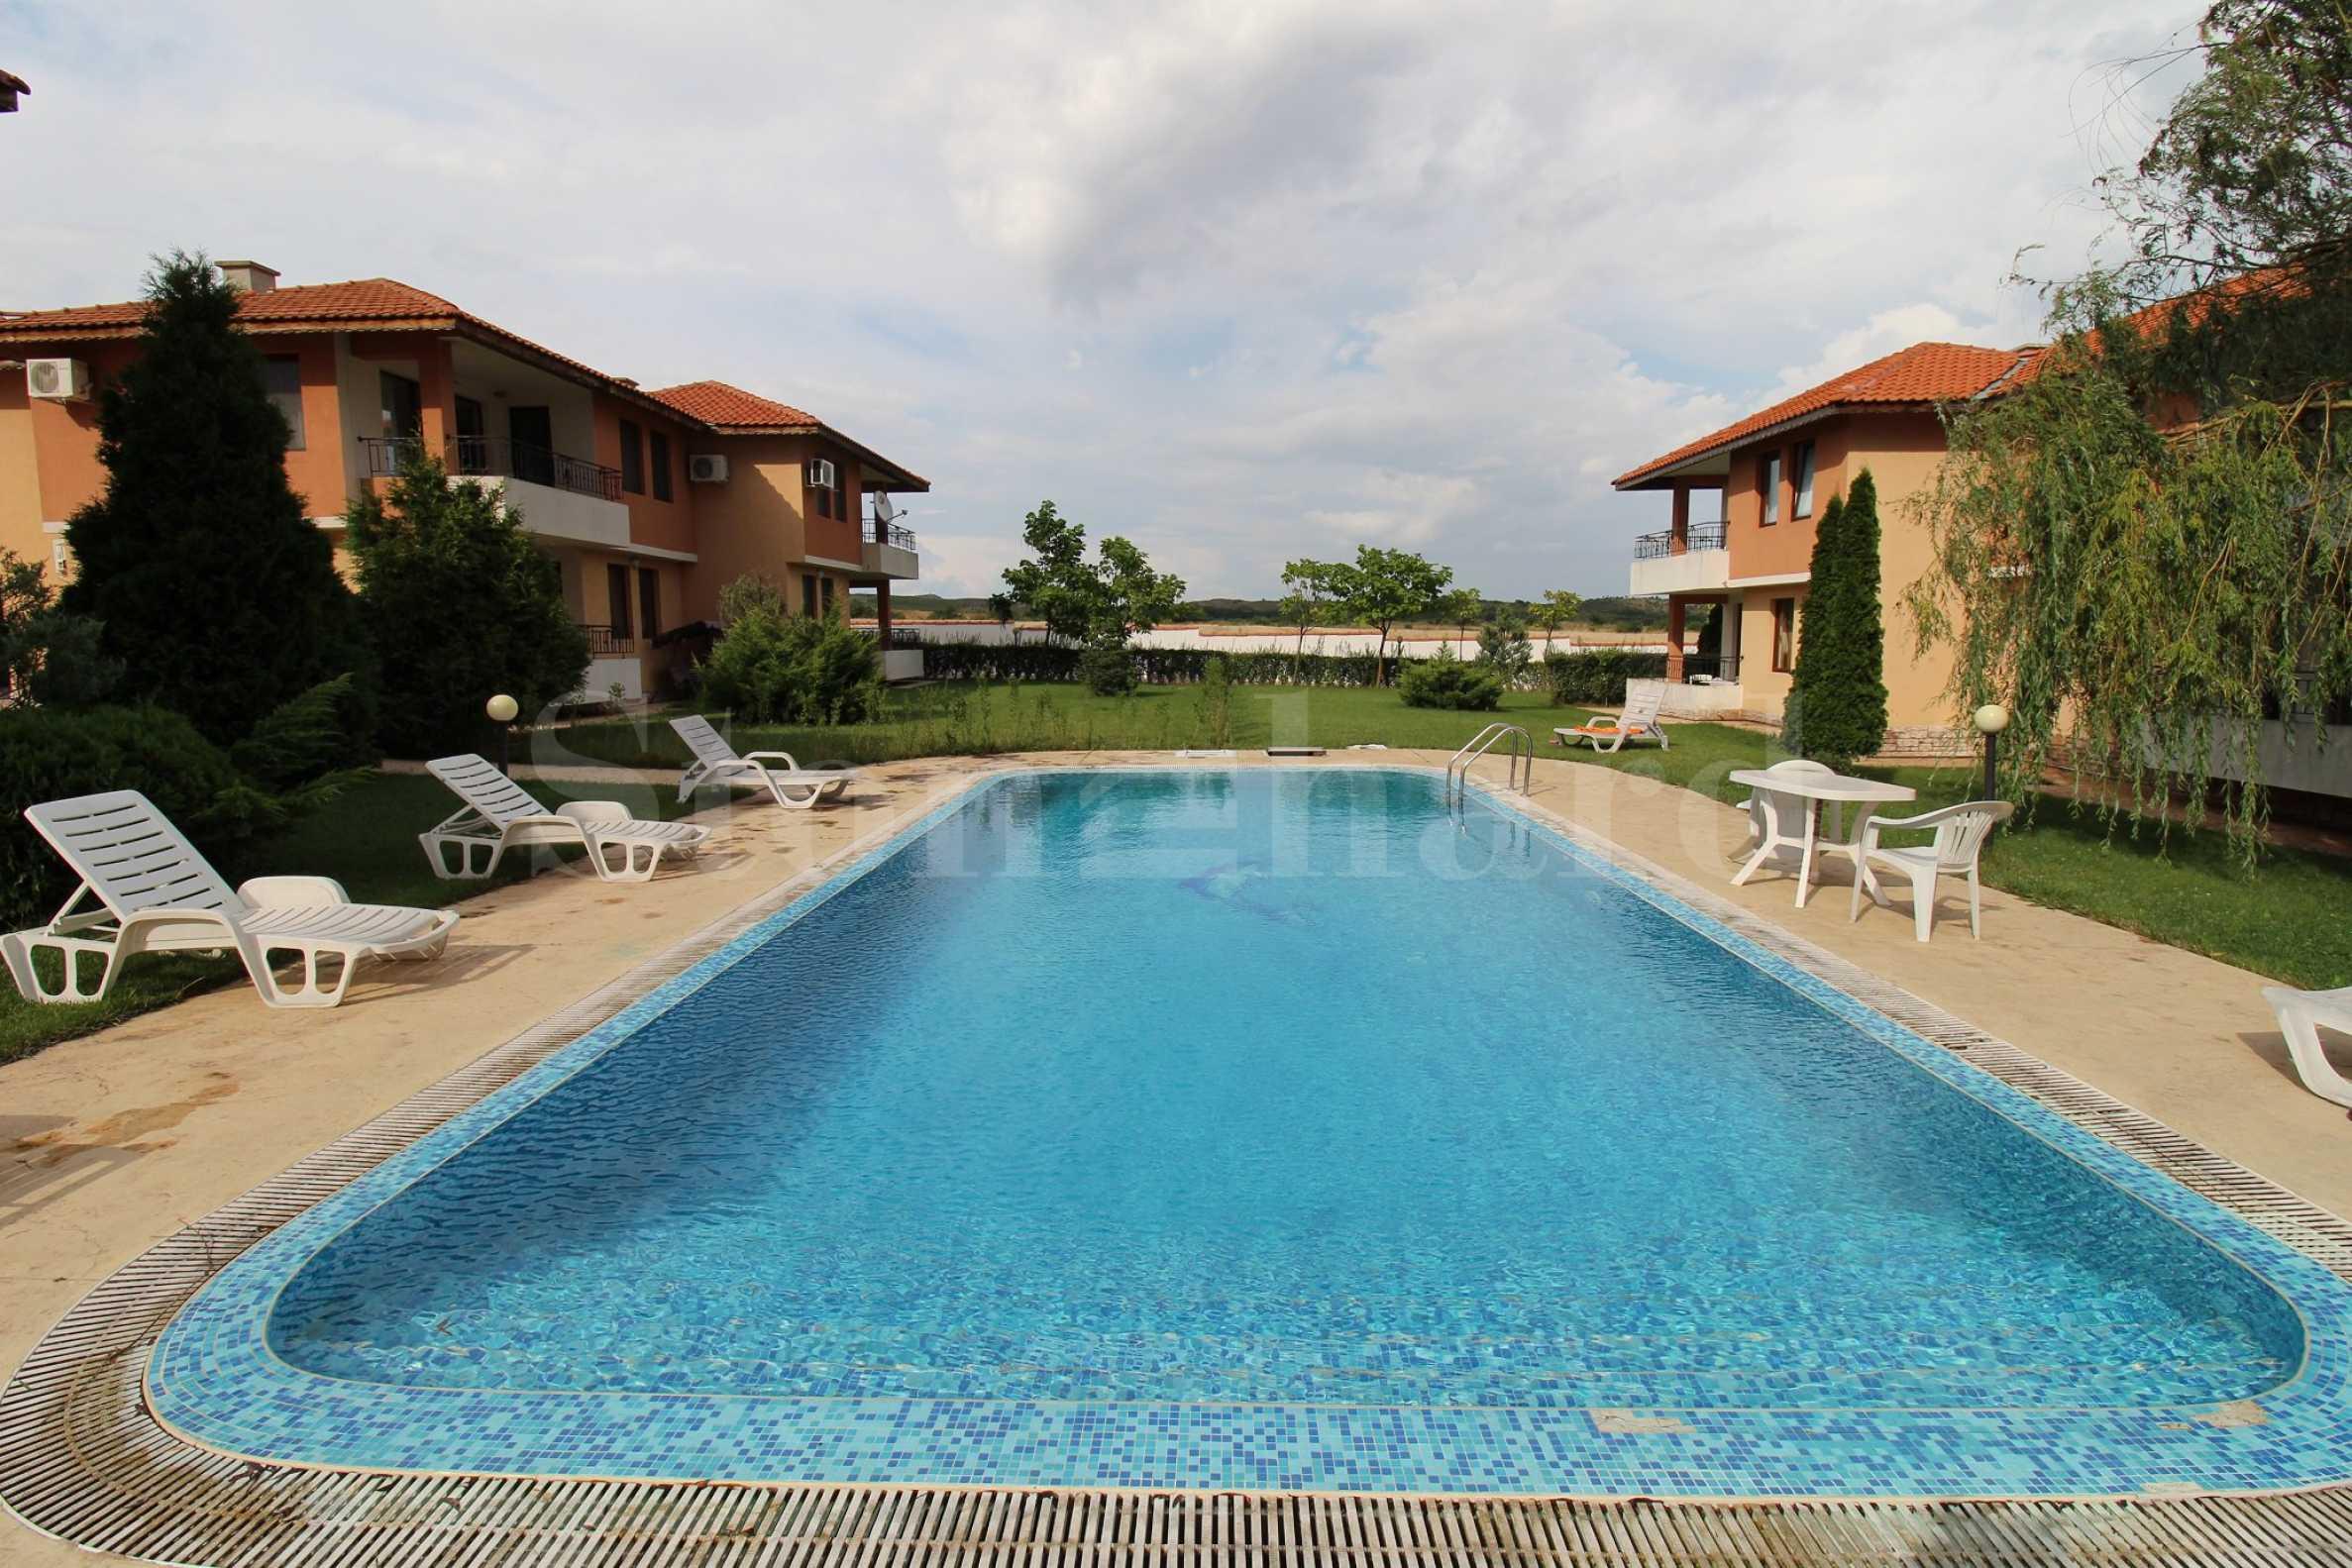 Turn-key villas in Laka village near Bourgas and Pomorie1 - Stonehard